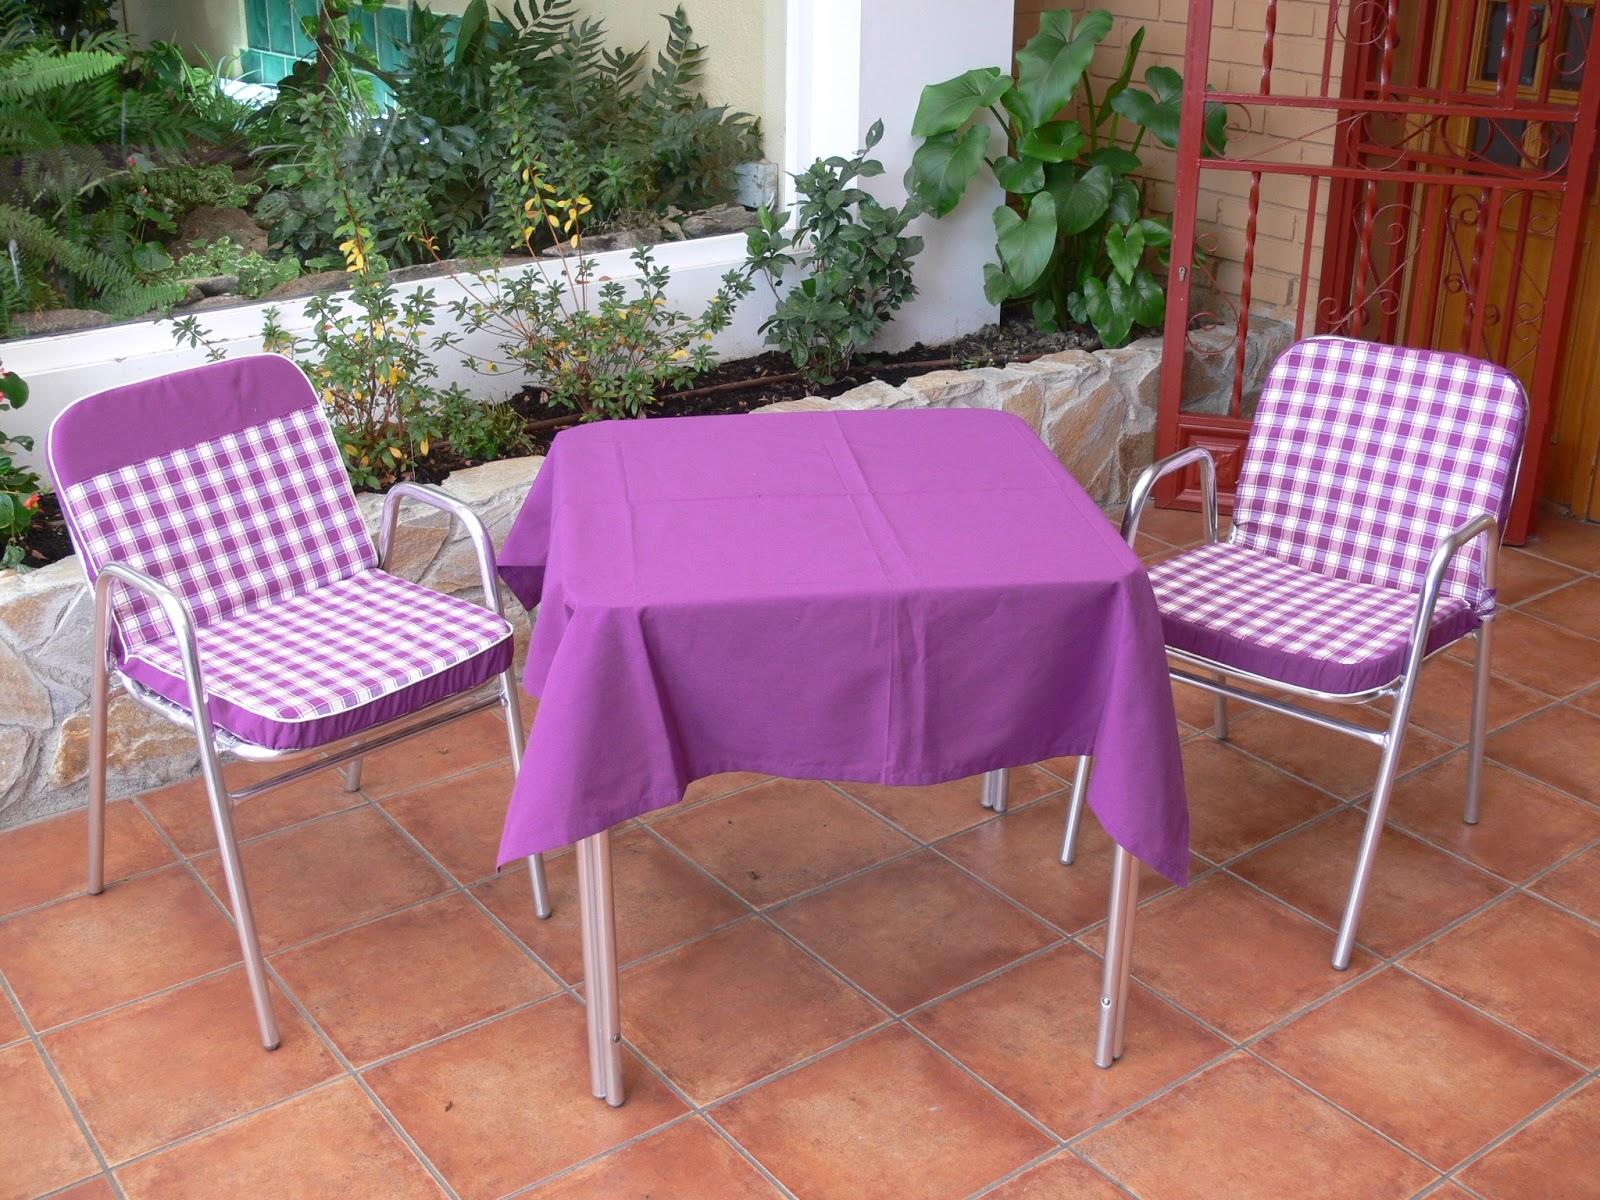 Pin cojines para sillas donkiz venta kamistad celebrity - Cojines sillas jardin ...